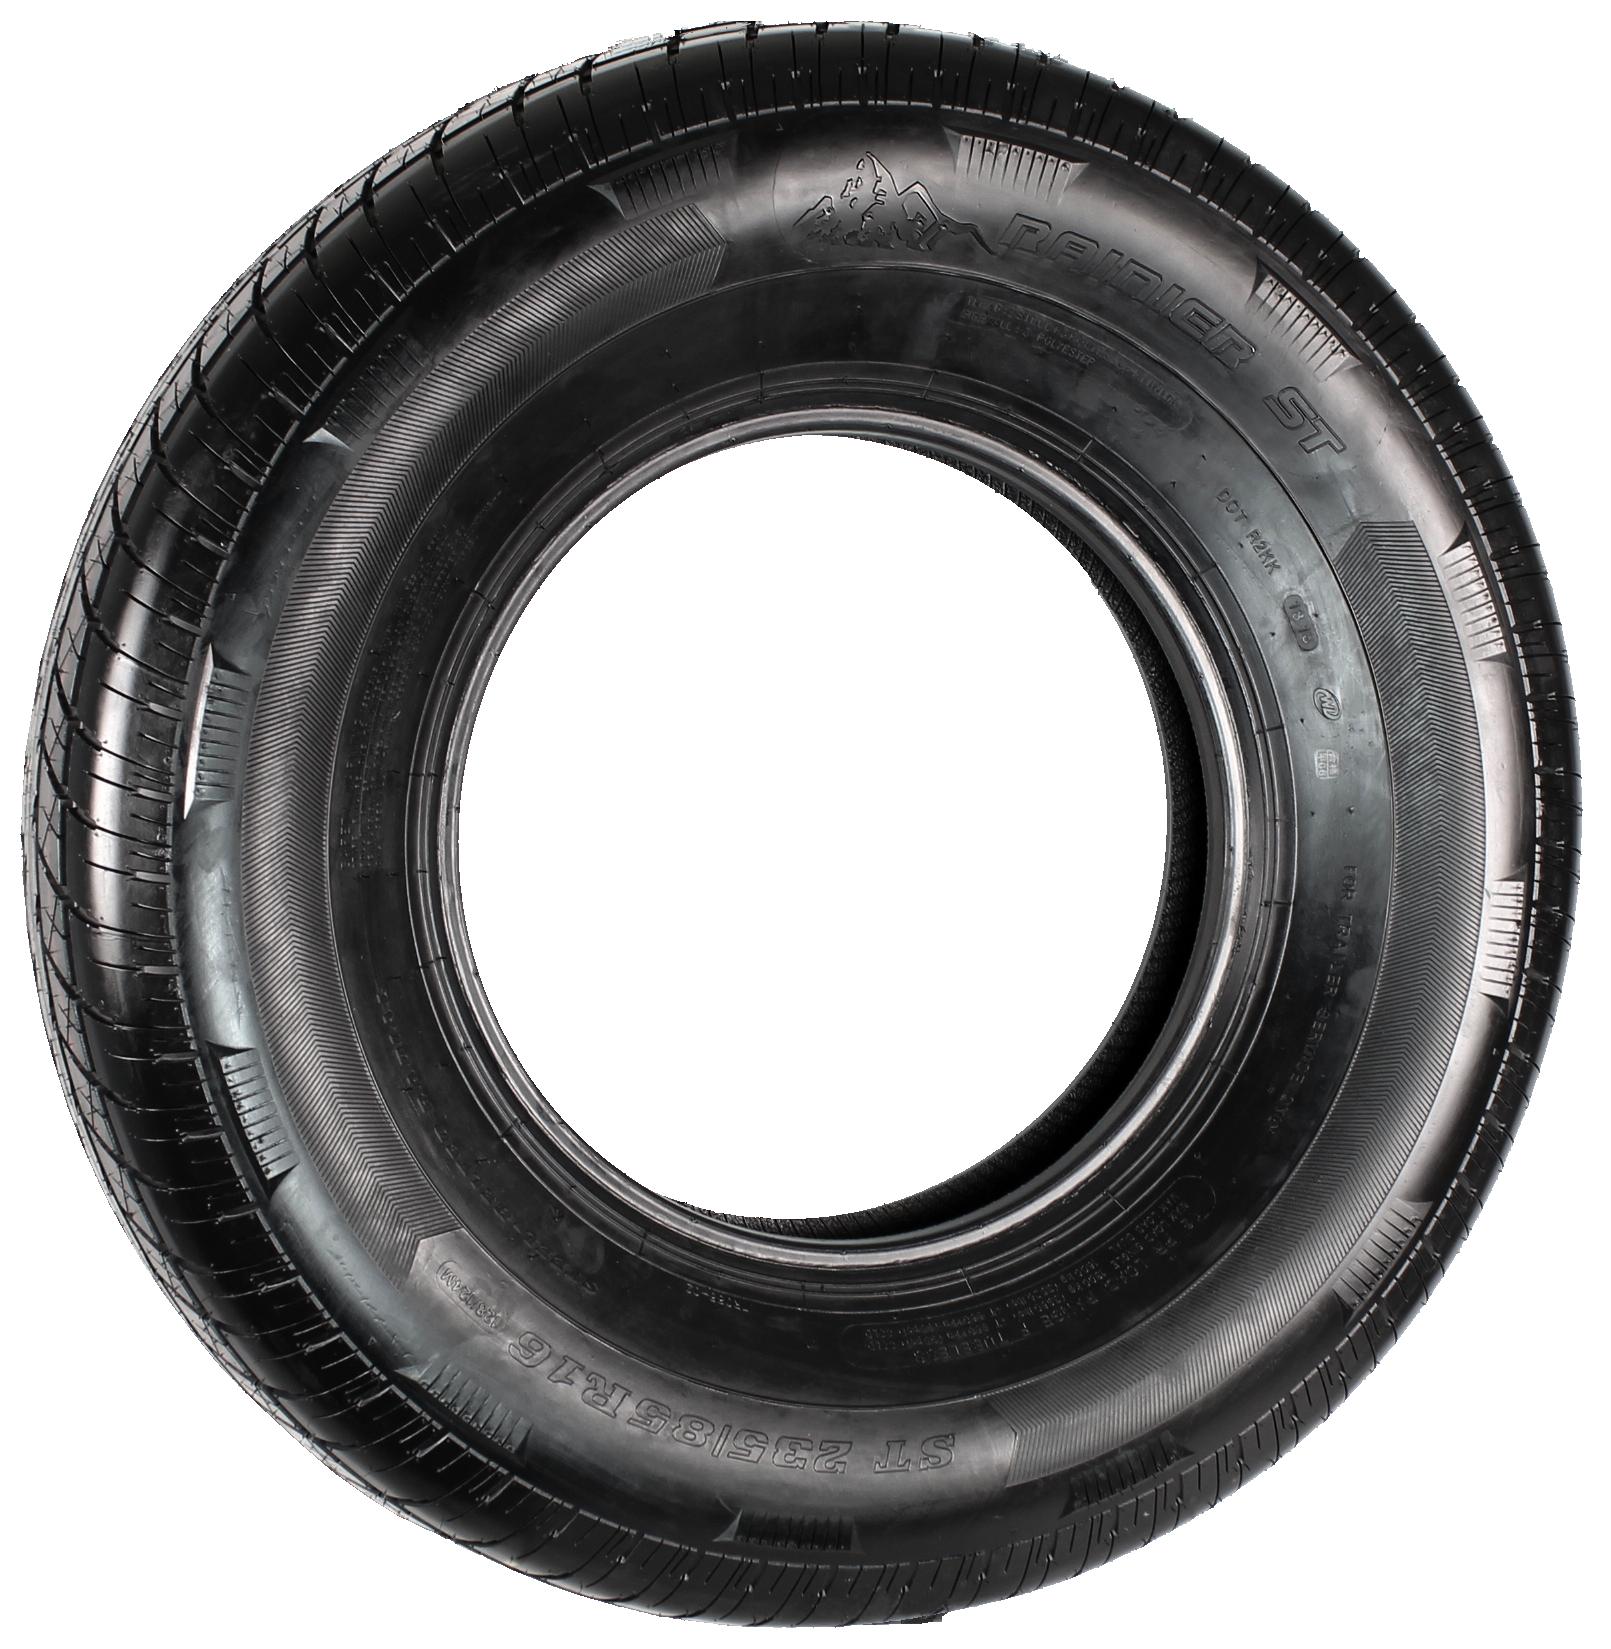 Rainier ST235/85R16 LRF 12-Ply Radial Trailer Tire Image